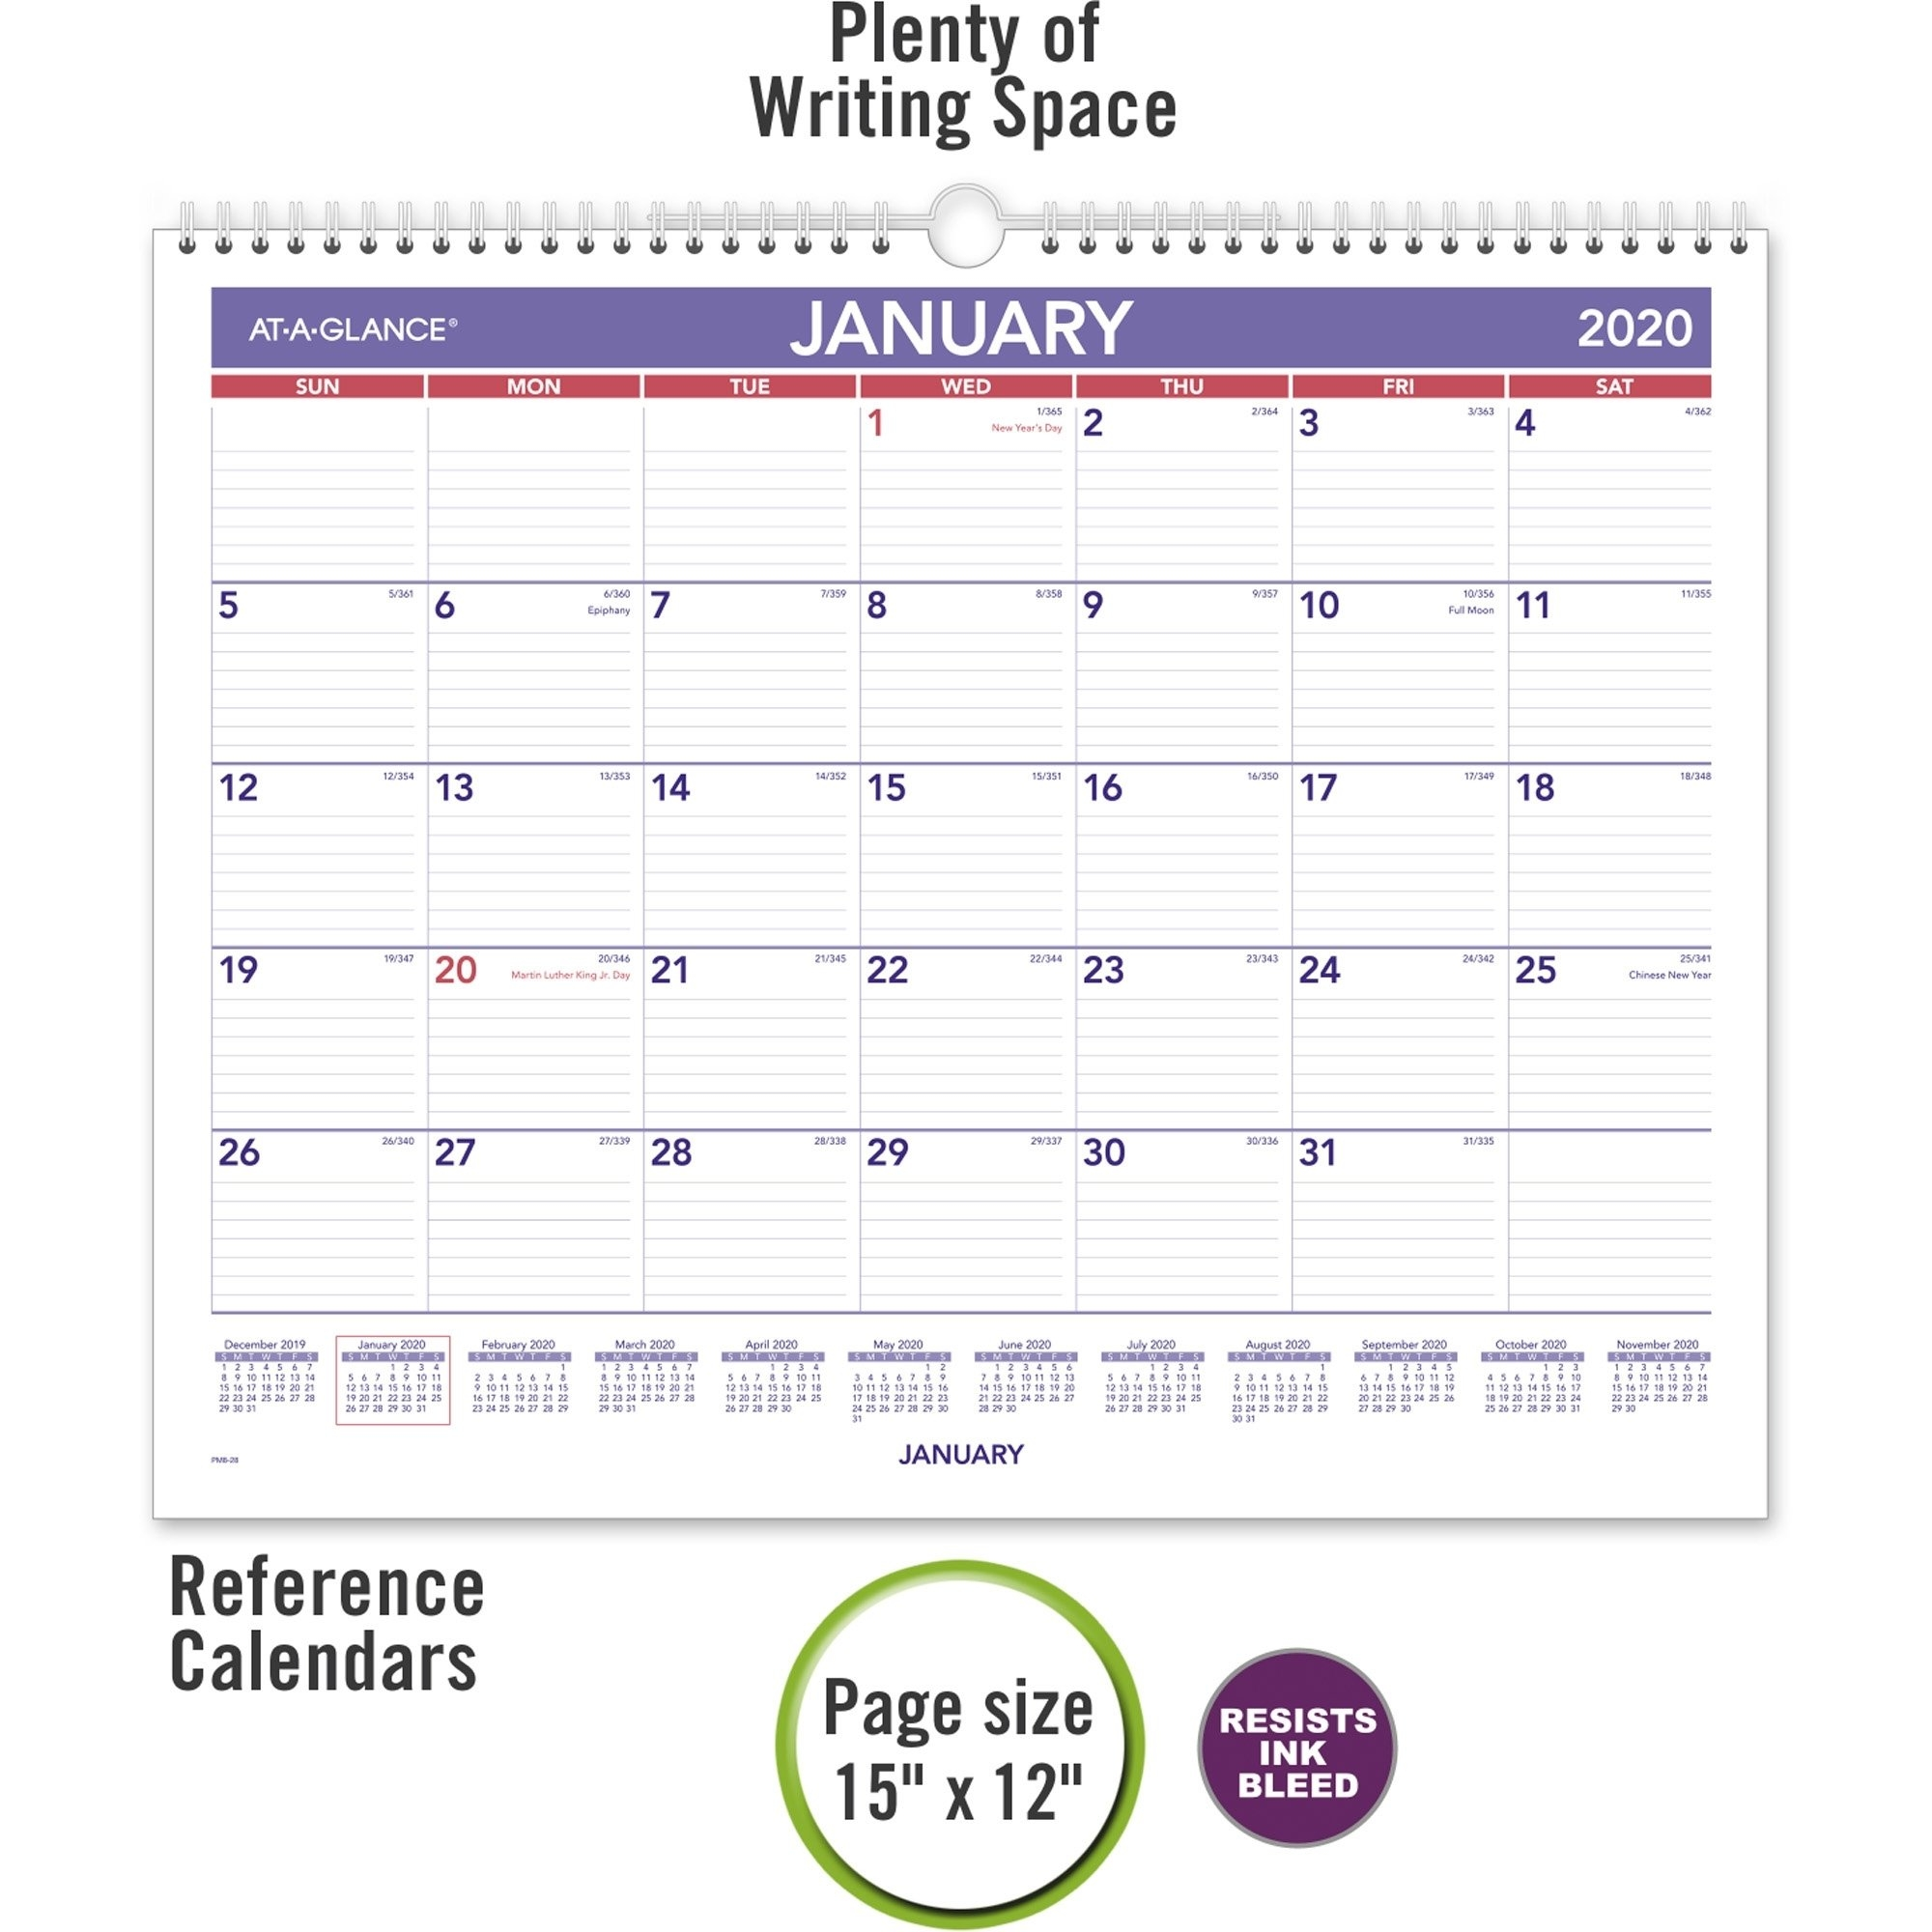 Military Julian Date 2021 | Printable Calendar Template 2021 for Julian Date Army 2021 Image